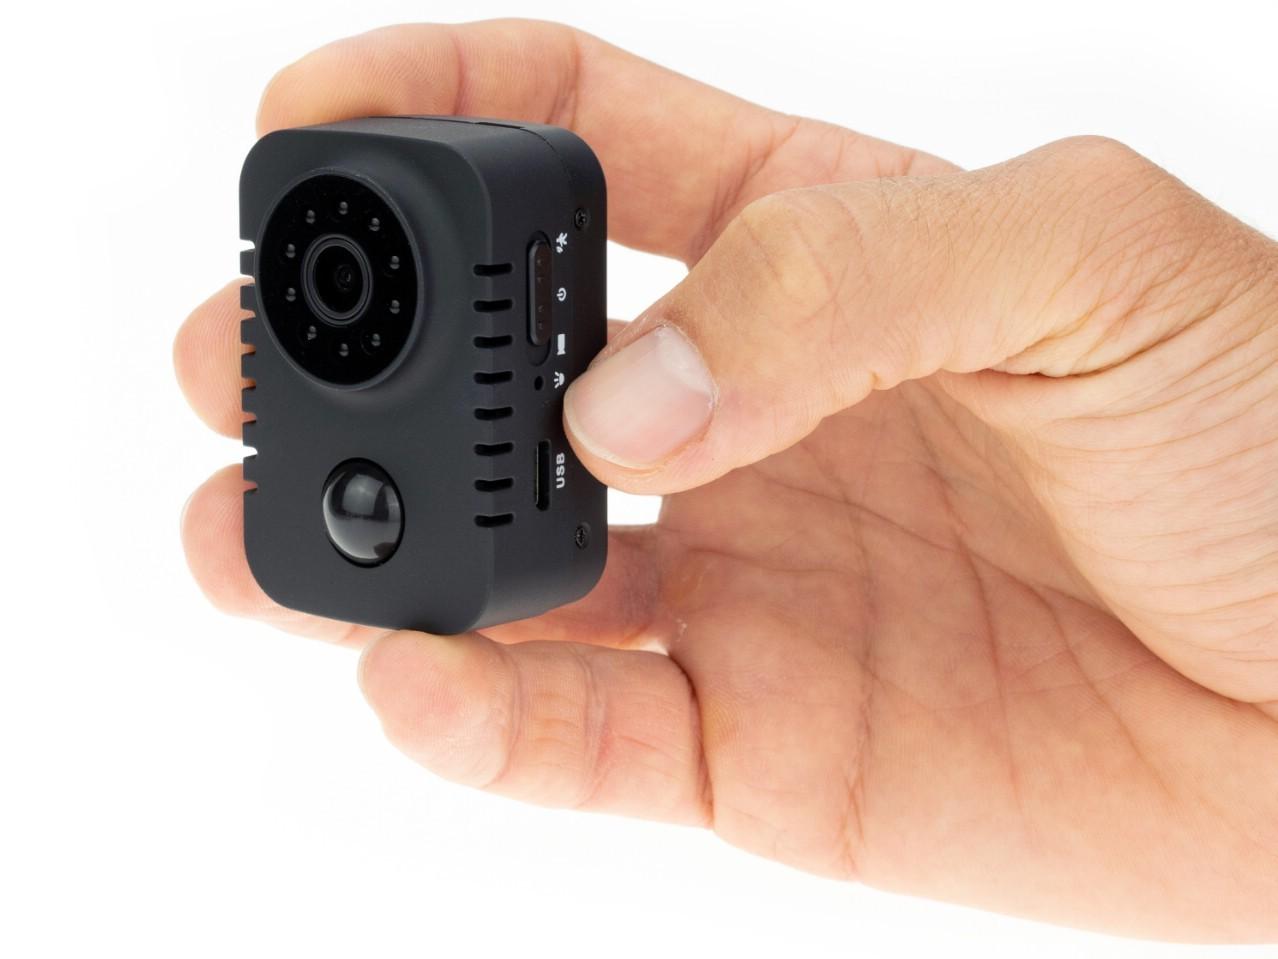 Мини камера Ambertek DV150 с записью на карту памяти